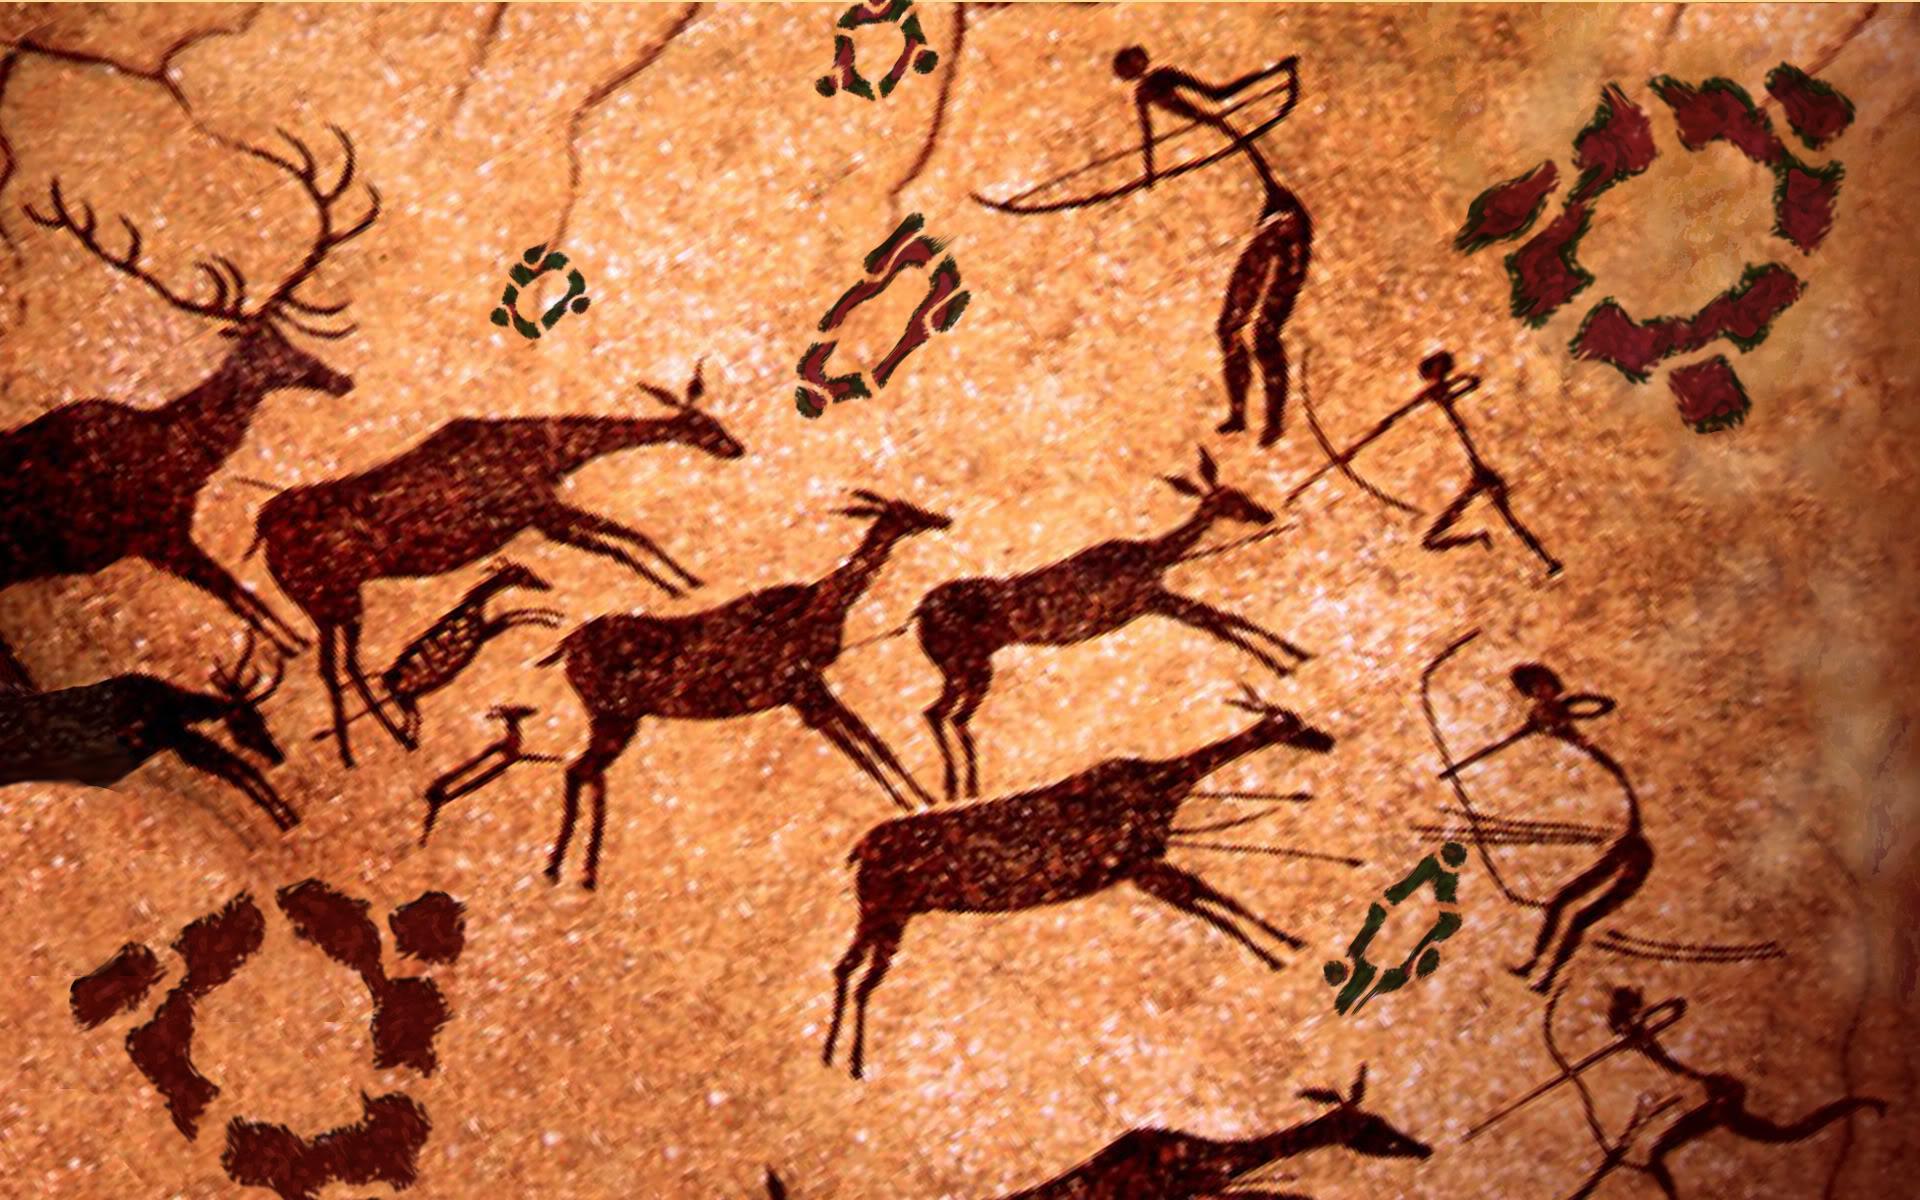 History wallpaper 1920x1200 71188 1920x1200